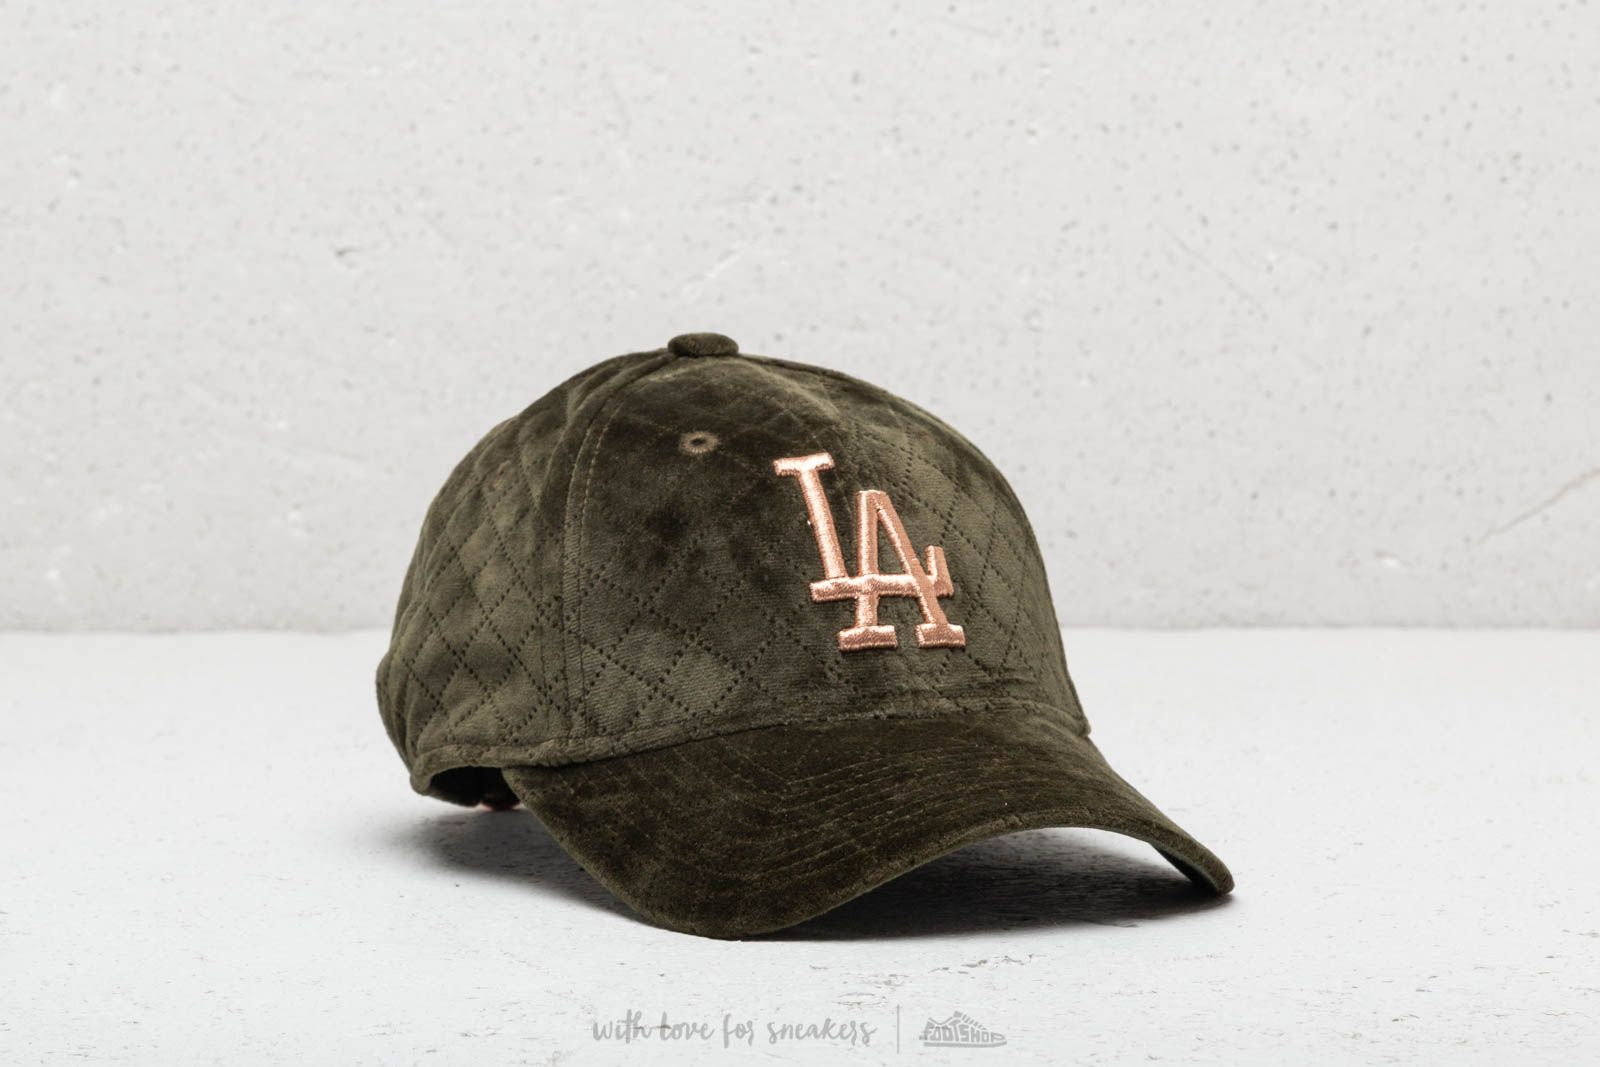 4e97cd00a0d3f2 New Era 940W MLB Winter Pack Wmn LOSDOD Green at a great price $24 buy at